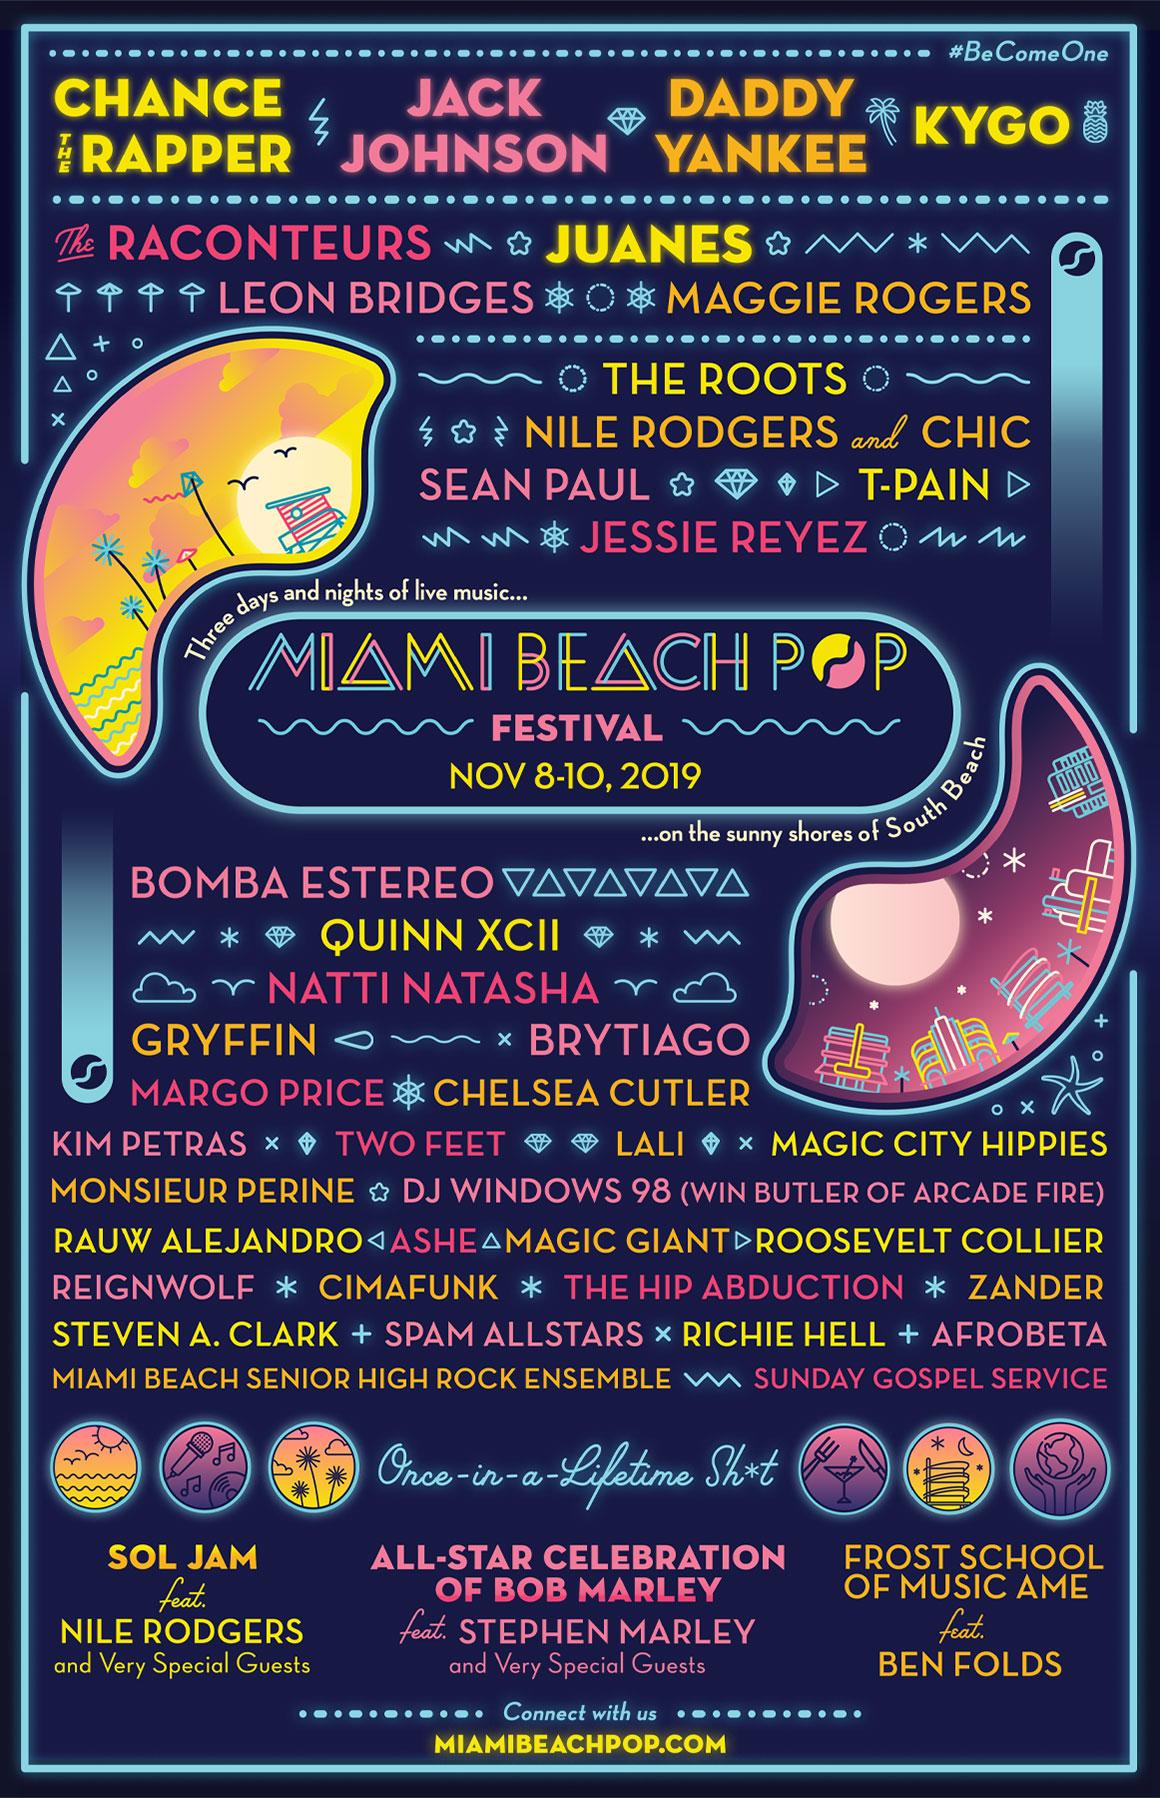 11 November 8 9 10 Miami Beach Pop Festival Miami FL Atlanta EDM Events Shows Concerts Festivals.jpg